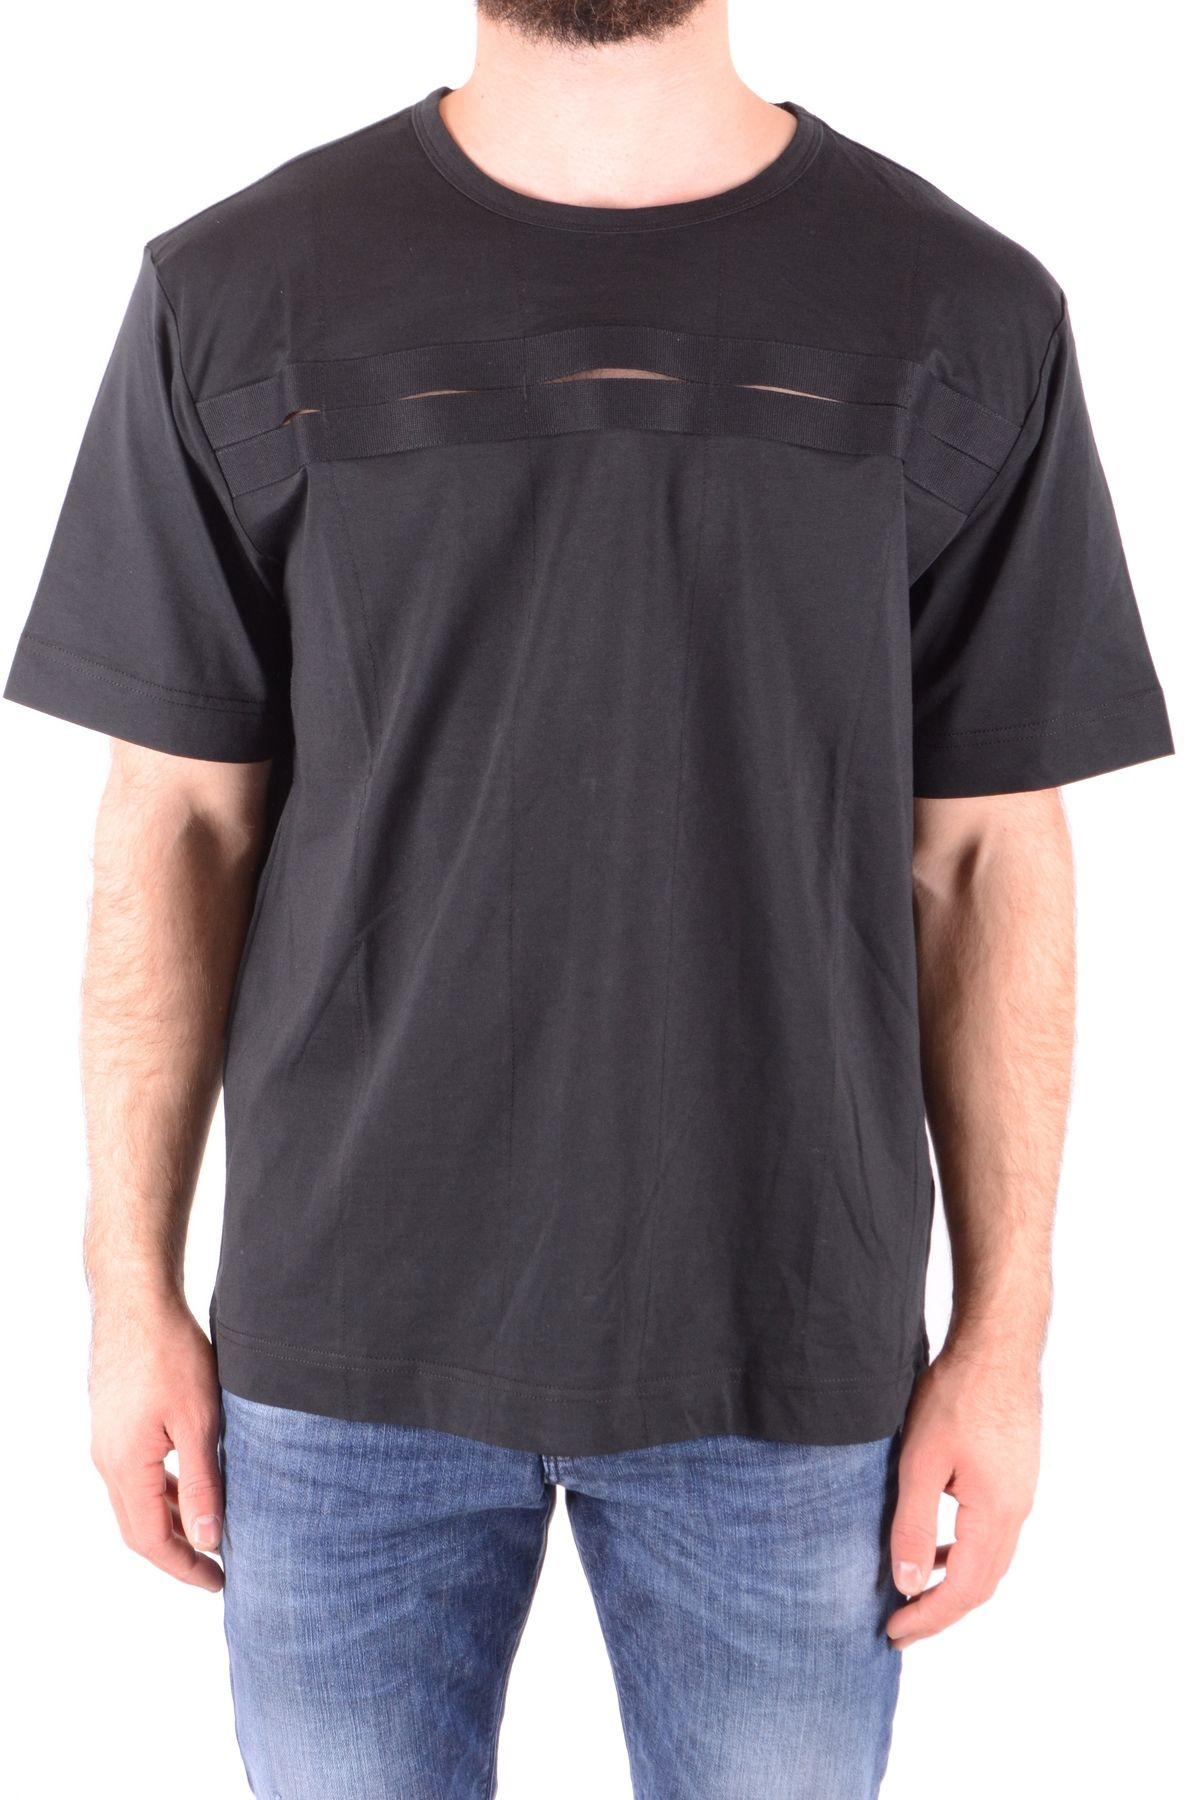 Diesel Black Gold Black Cotton Polo Shirt